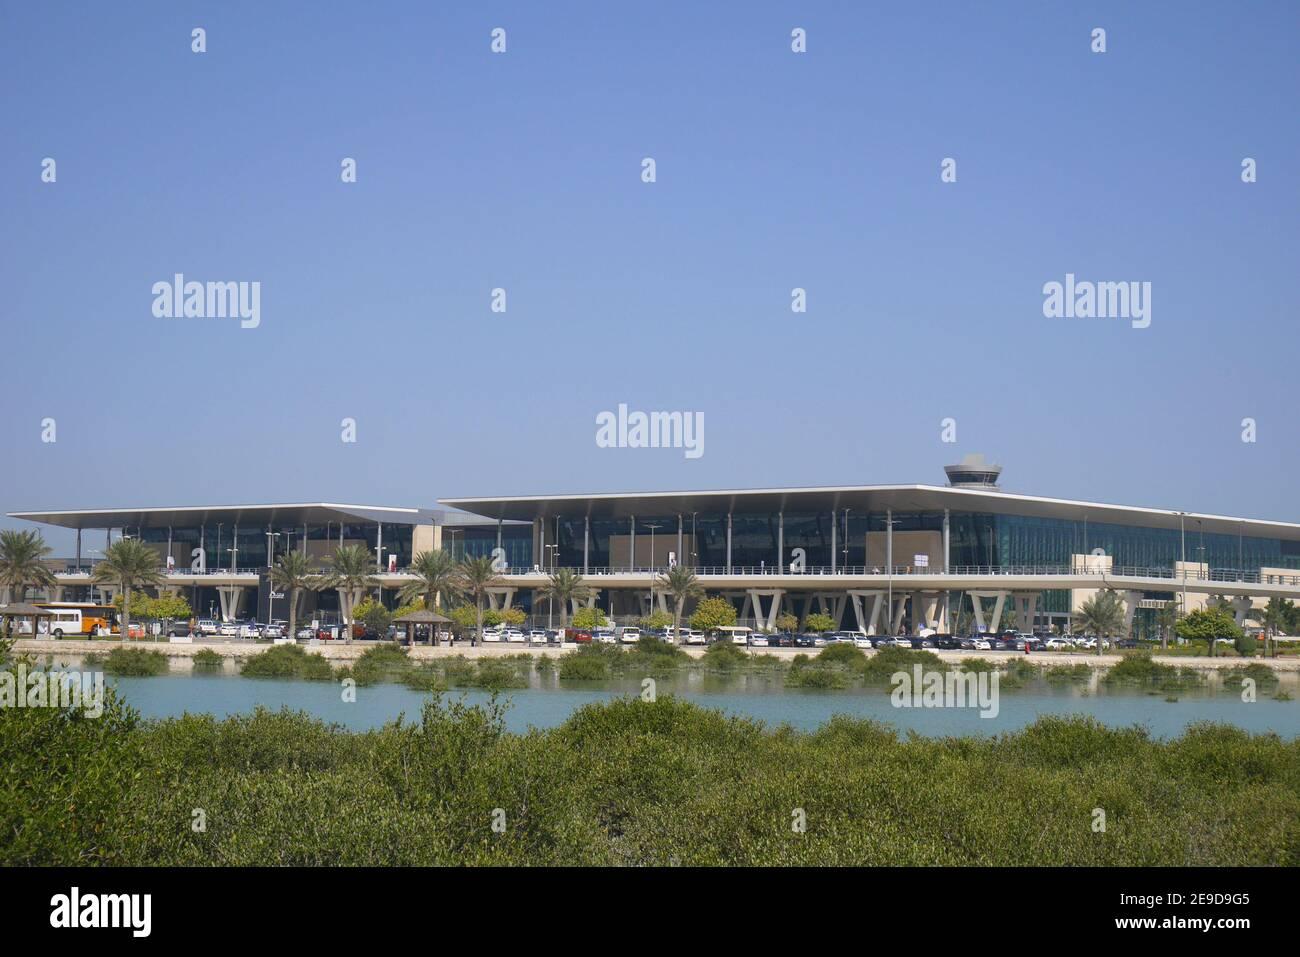 The new passenger terminal building, seen from across the Arad Bay mangroves, Bahrain International Airport, Muharraq, Kingdom of Bahrain Stock Photo